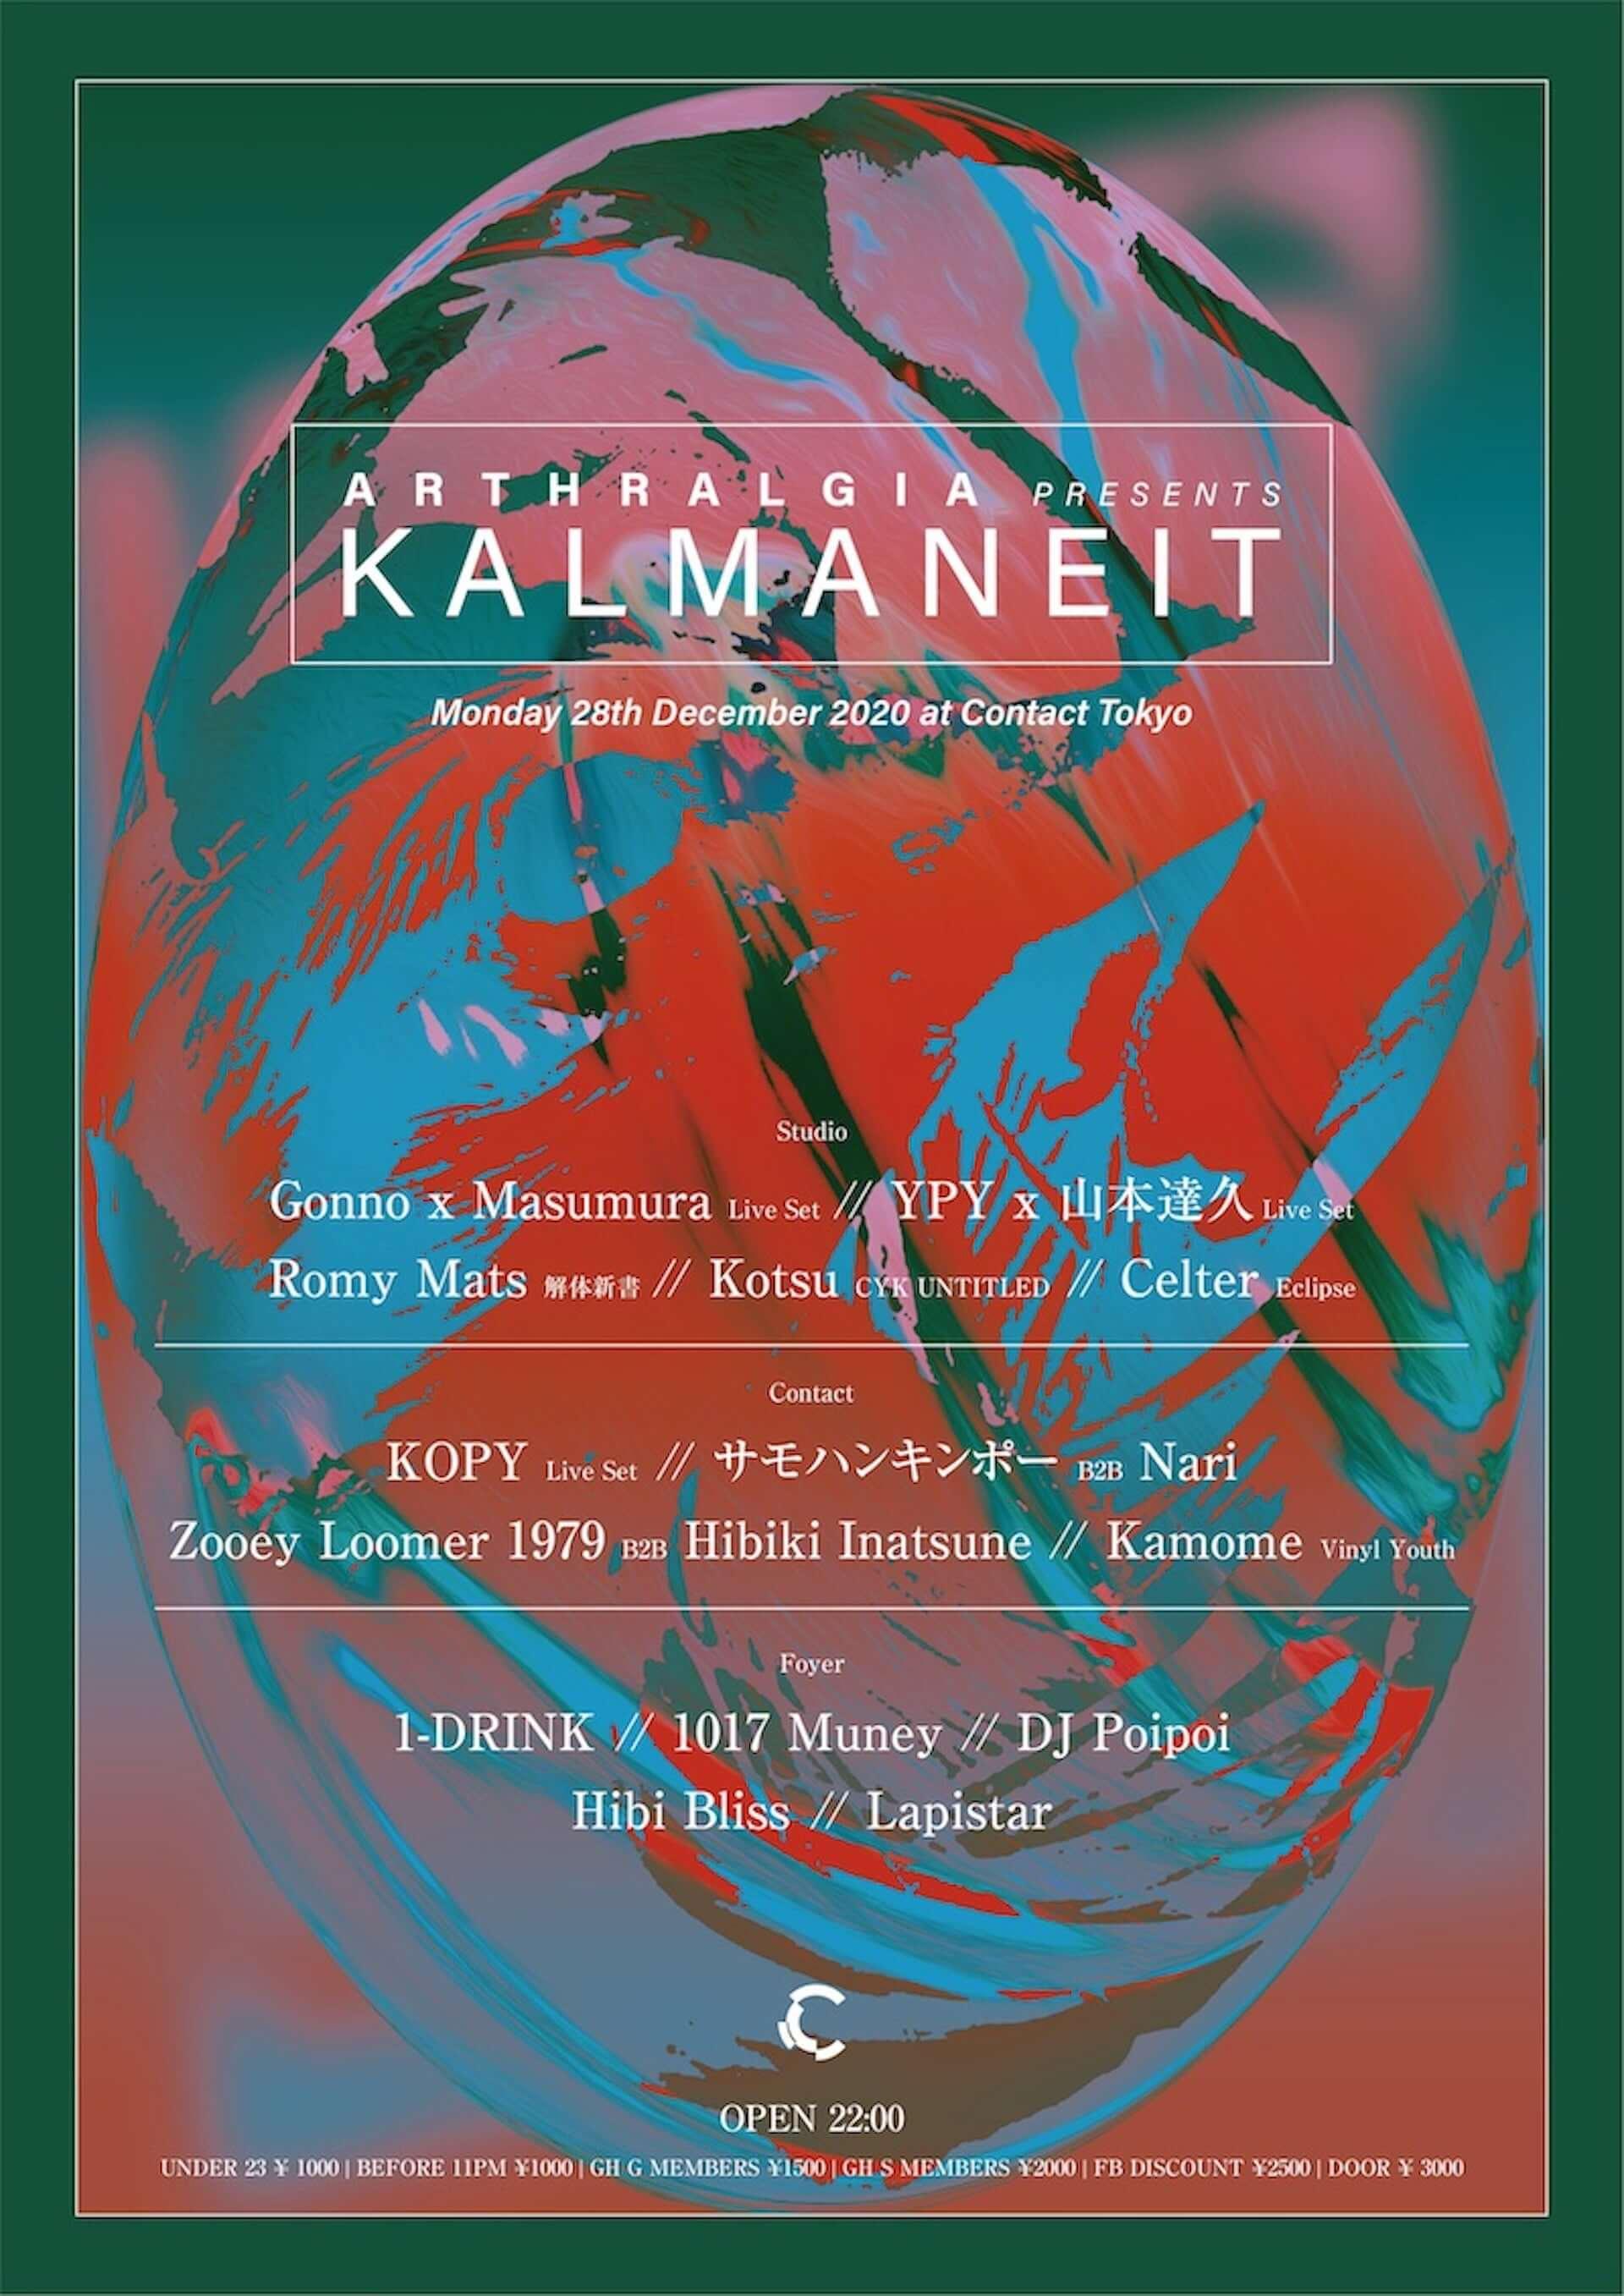 Gonno×Masumura、YPY×山本達久のコラボライブなど盛り沢山!渋谷Contactにて年末の祝祭<KALMANEIT>が開催決定 music201208_contact_5-1920x2714